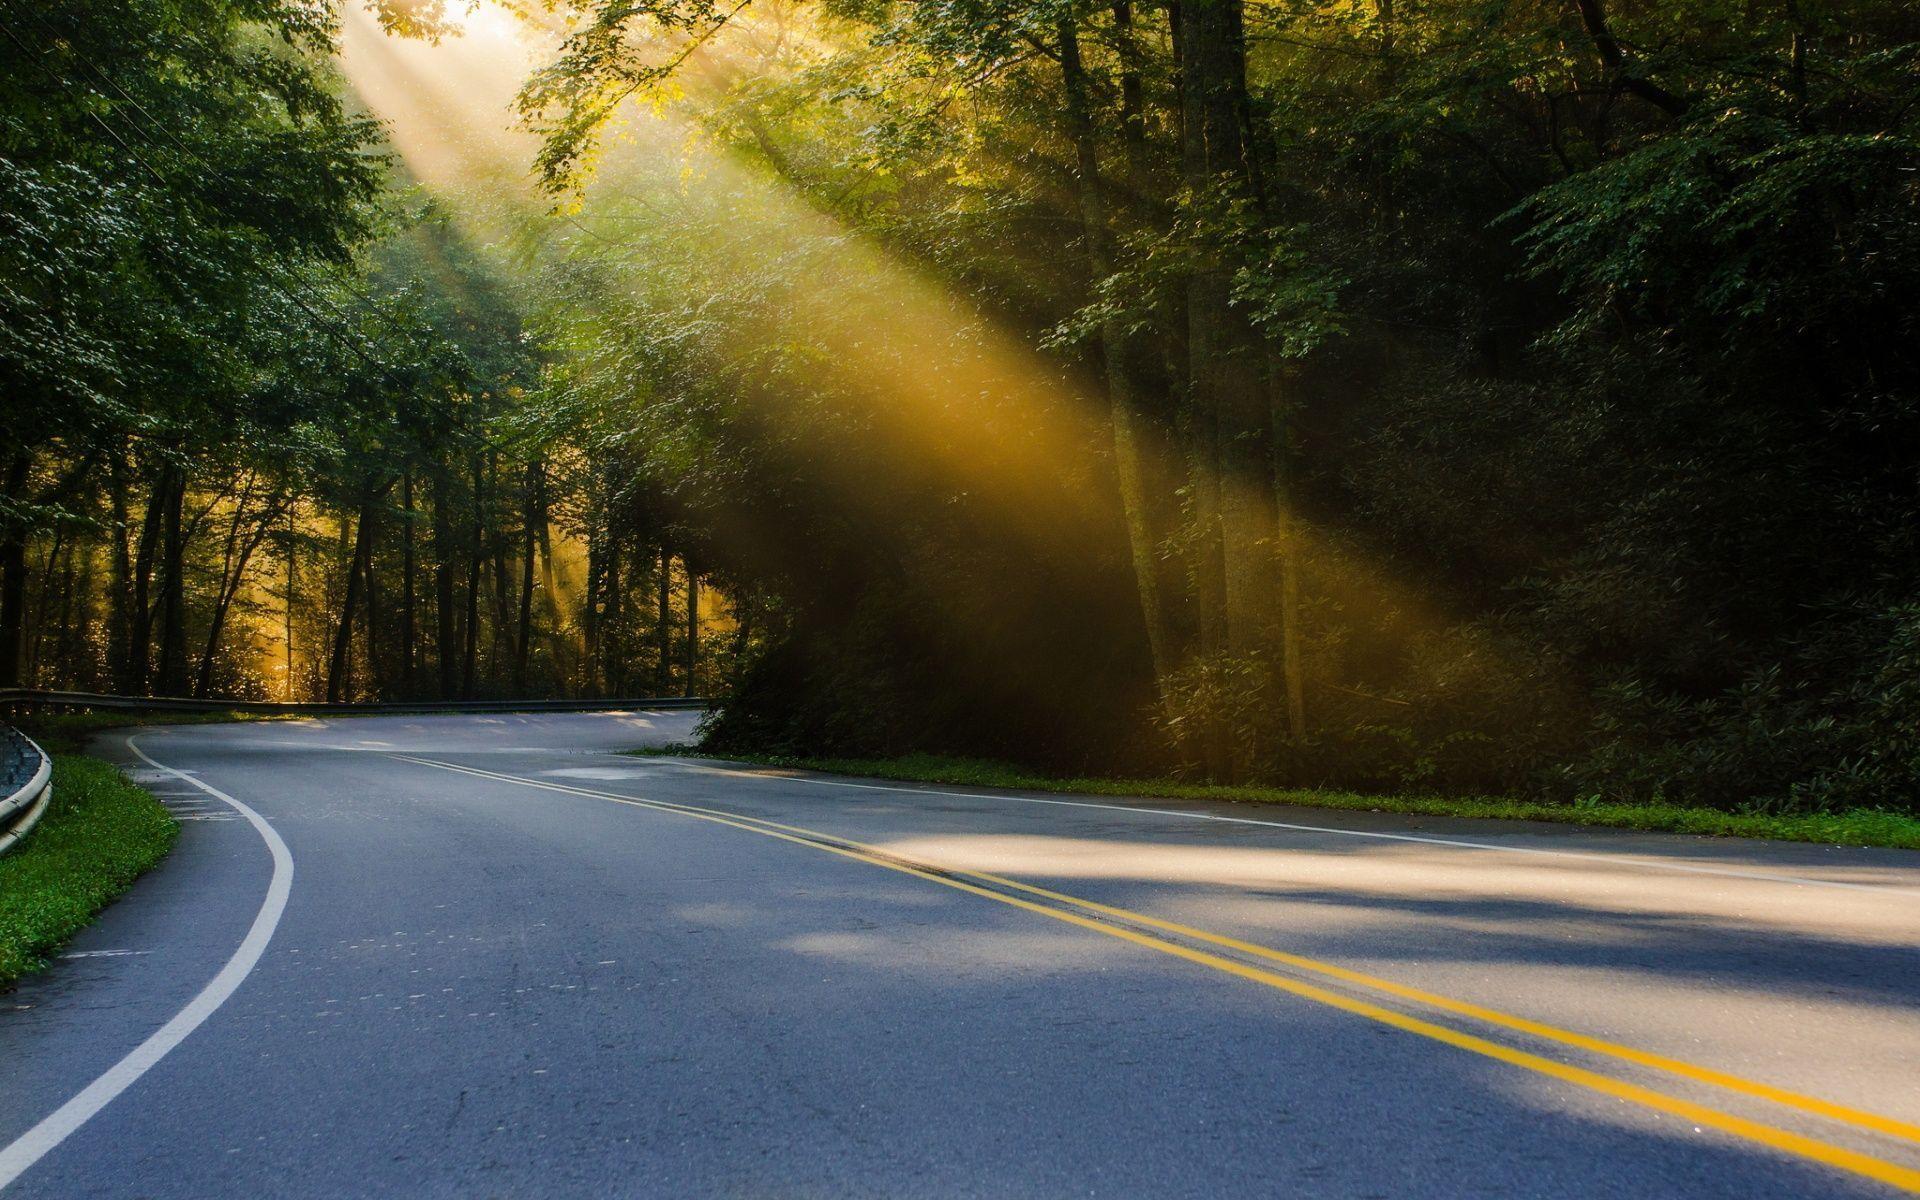 Beautiful Roads Wallpapers Top Free Beautiful Roads Backgrounds Wallpaperaccess